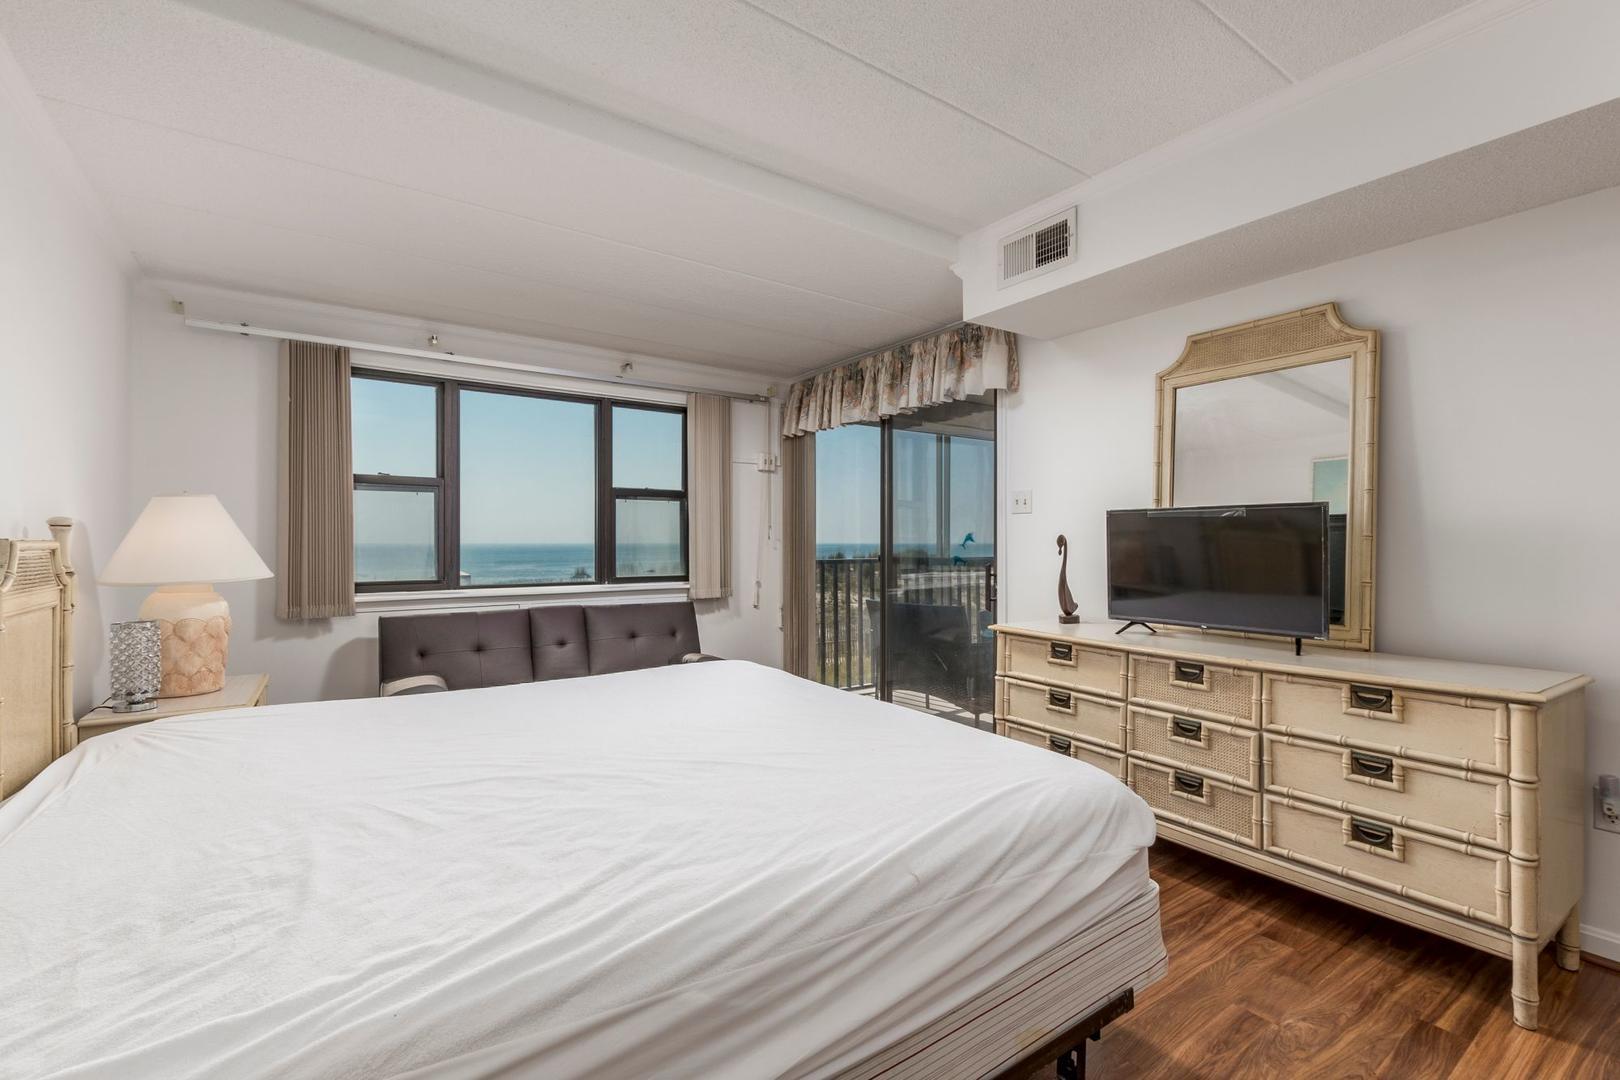 Amber Waves 101 - Master Bedroom